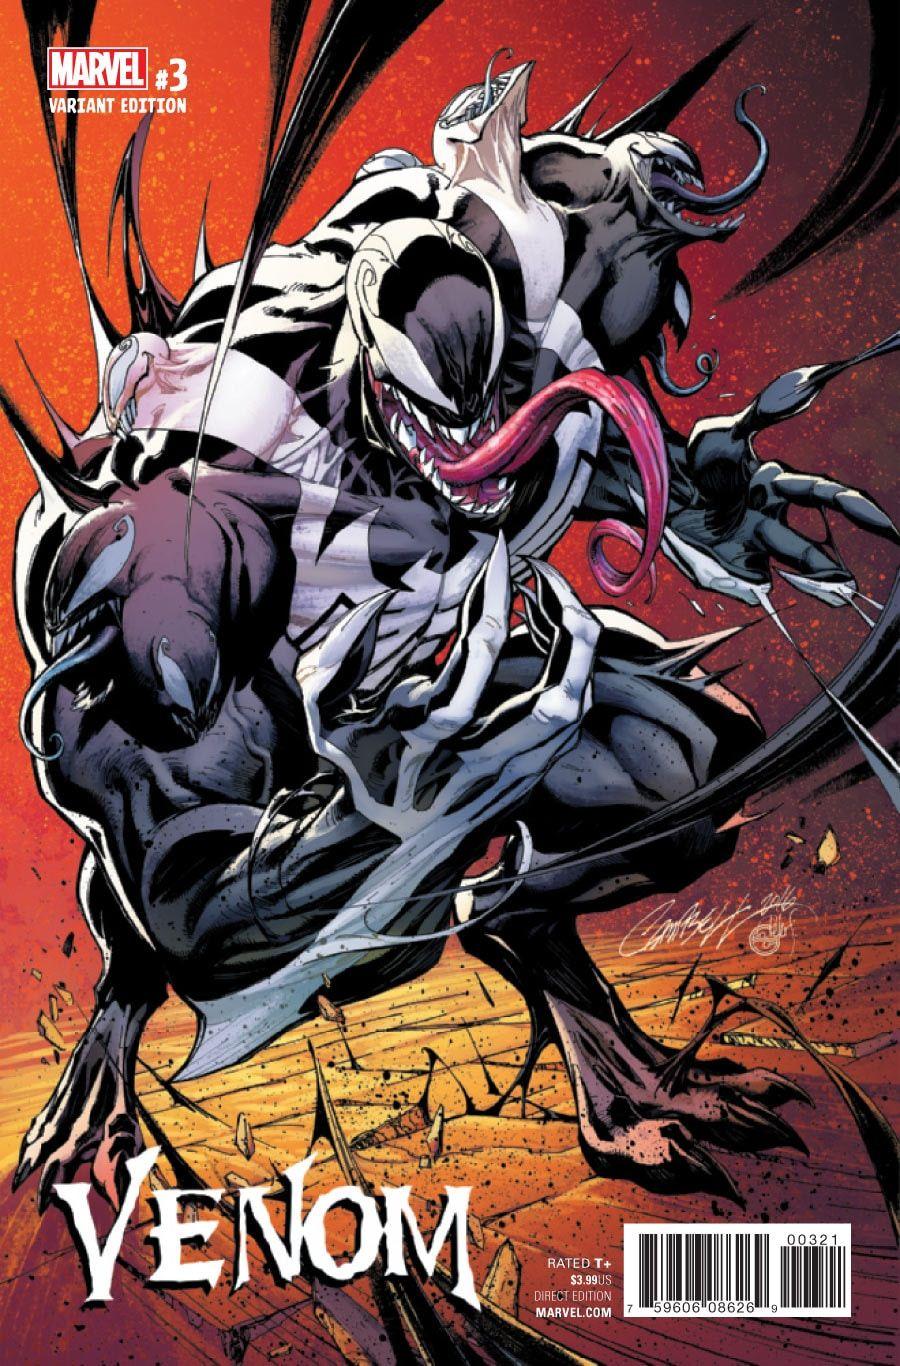 Venom #Fan #Art  (Venom Vol 3 #3 Variant Cover) By: J  Scott